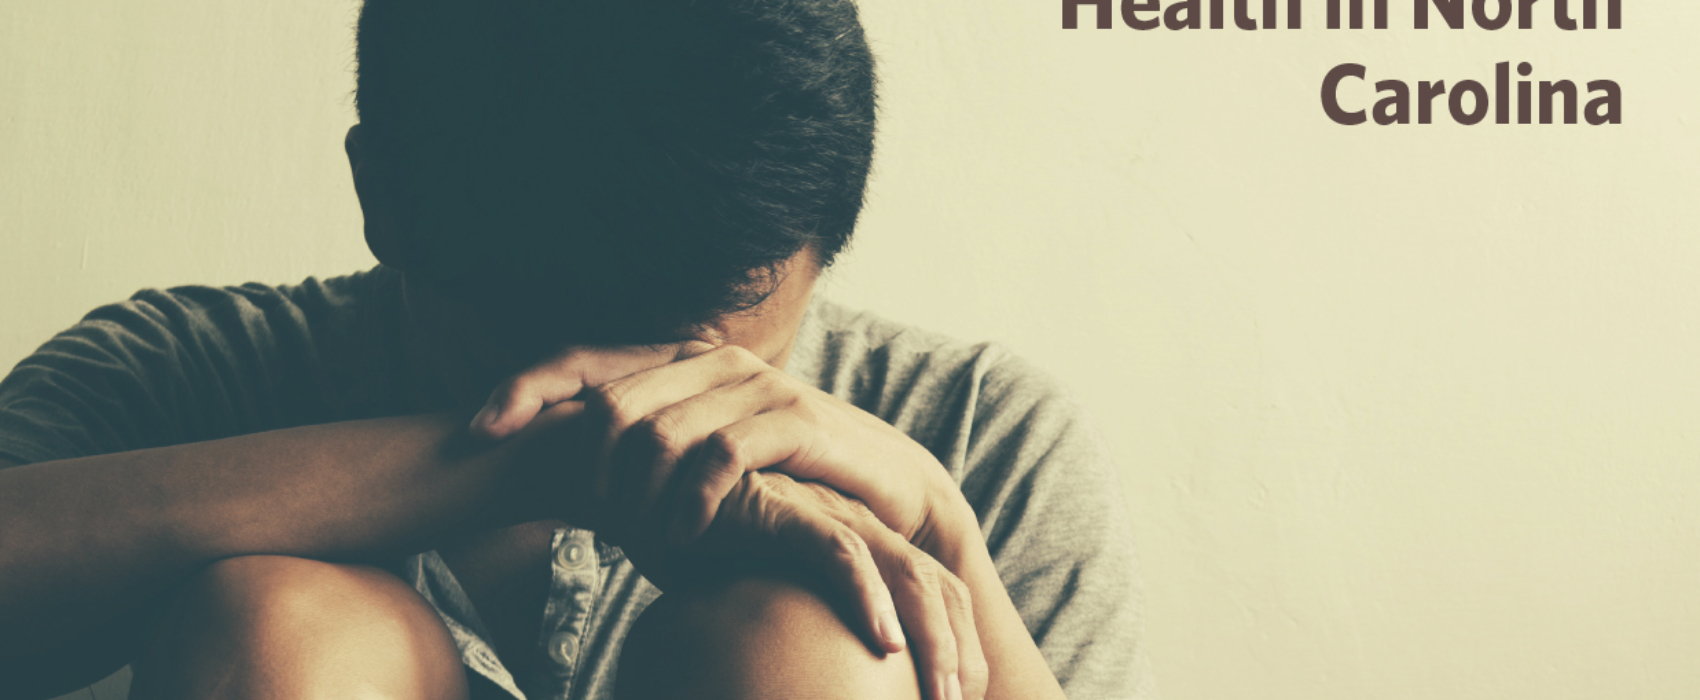 Youth Behavioral Health in North Carolina